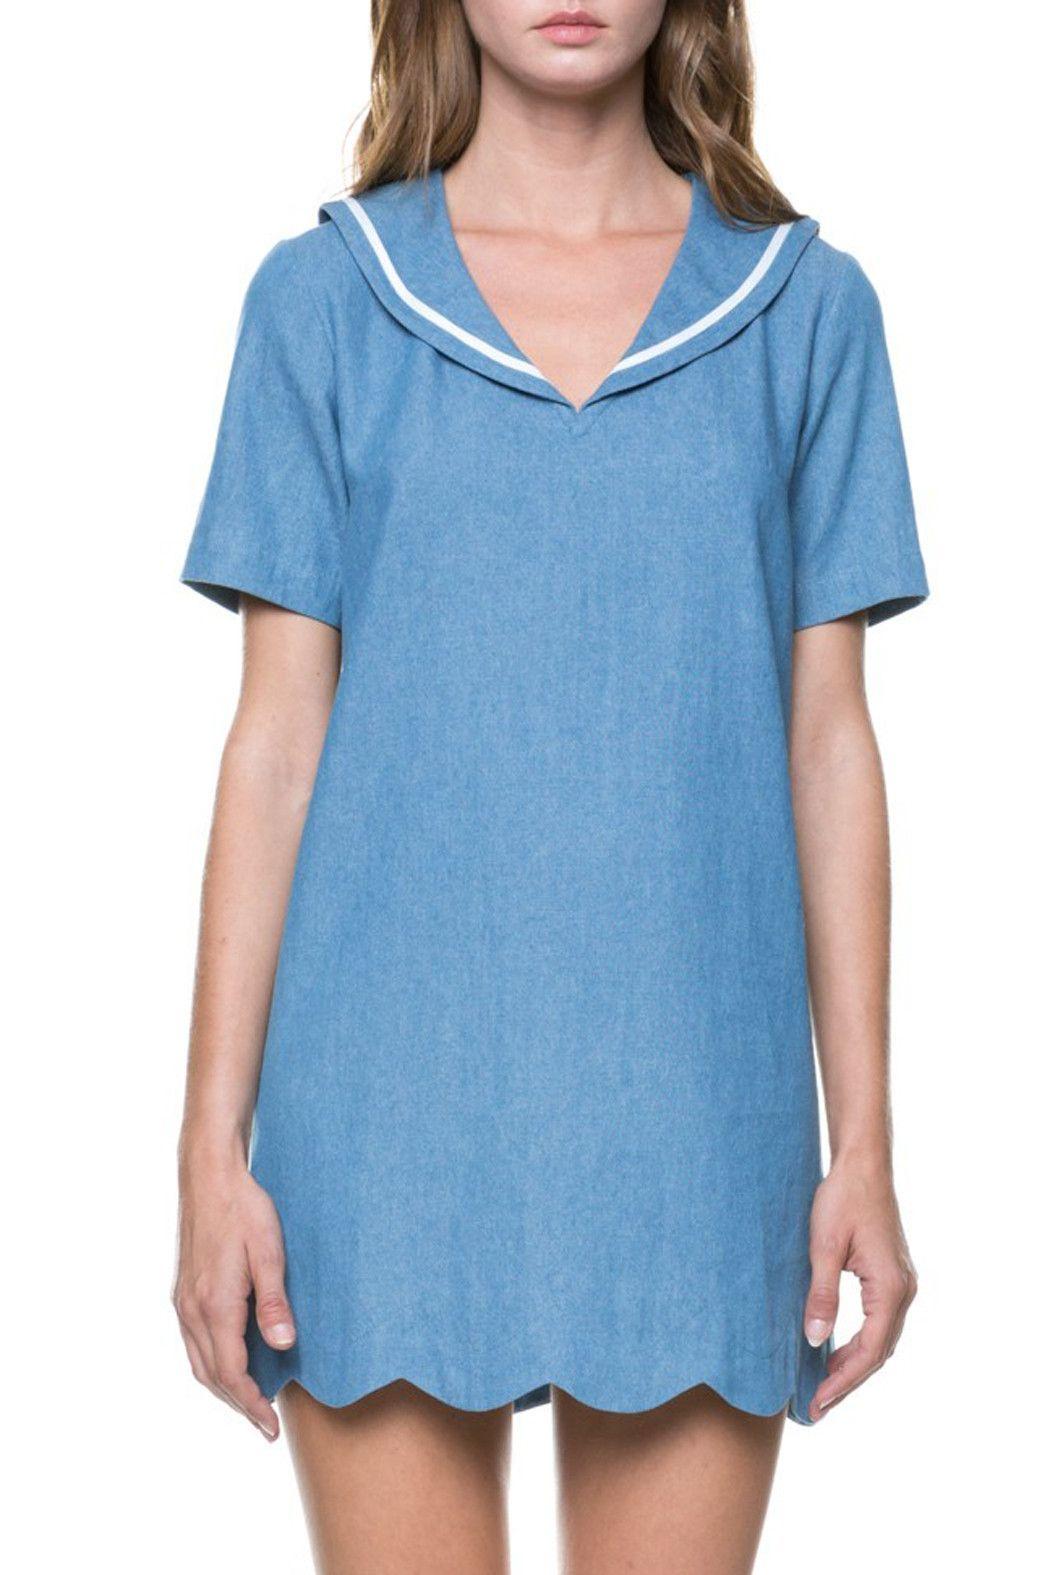 Sailor Denim Dress